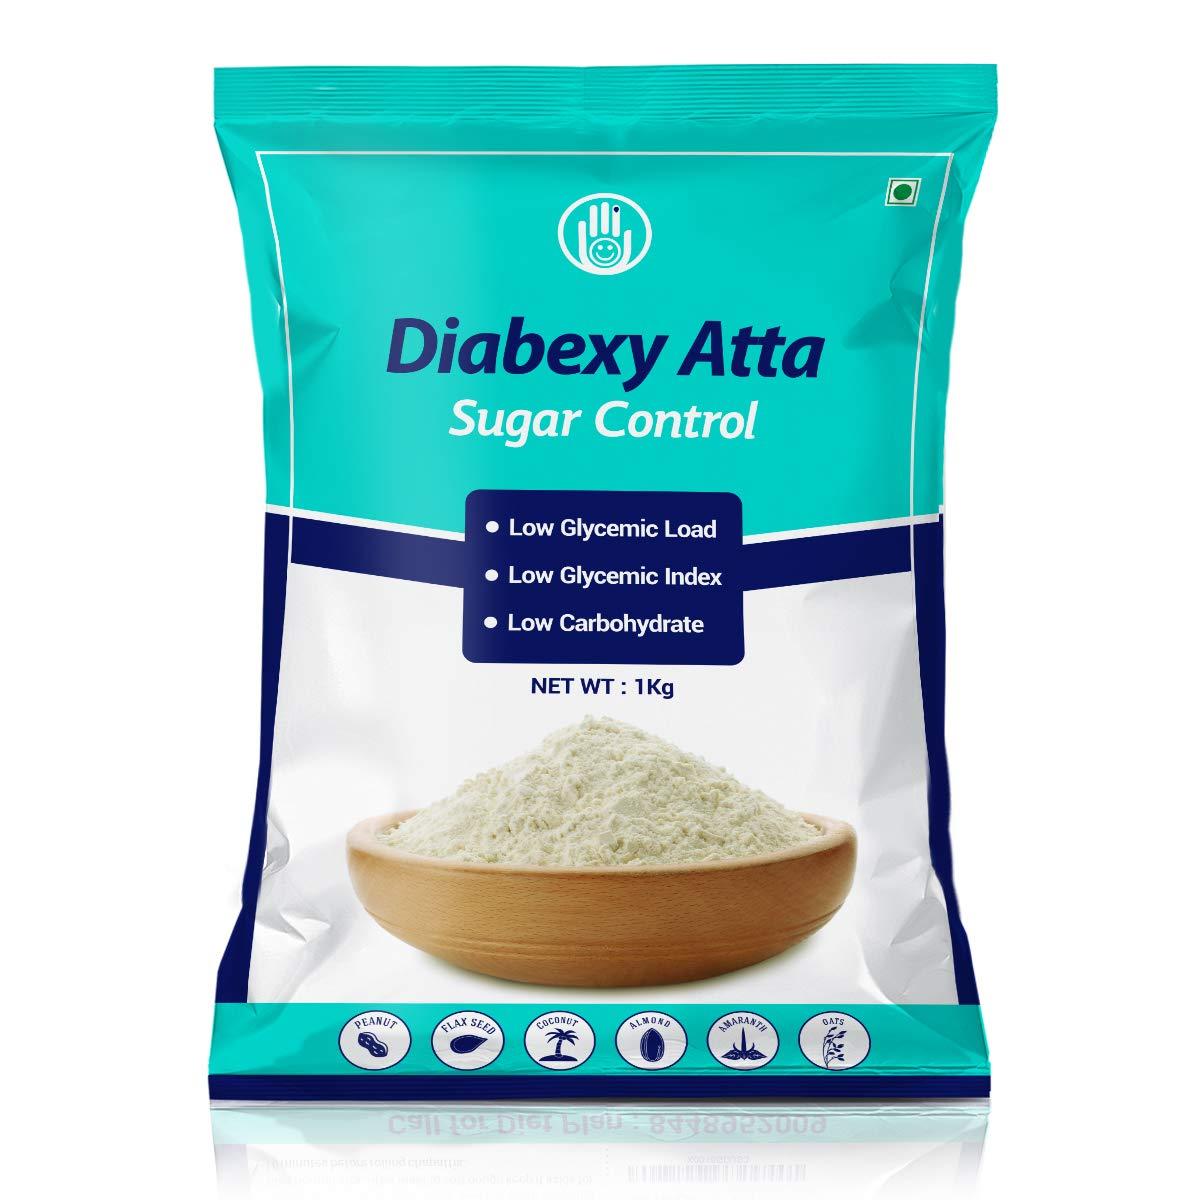 Diabexy Atta Sugar Control for Diabetes - 1kg